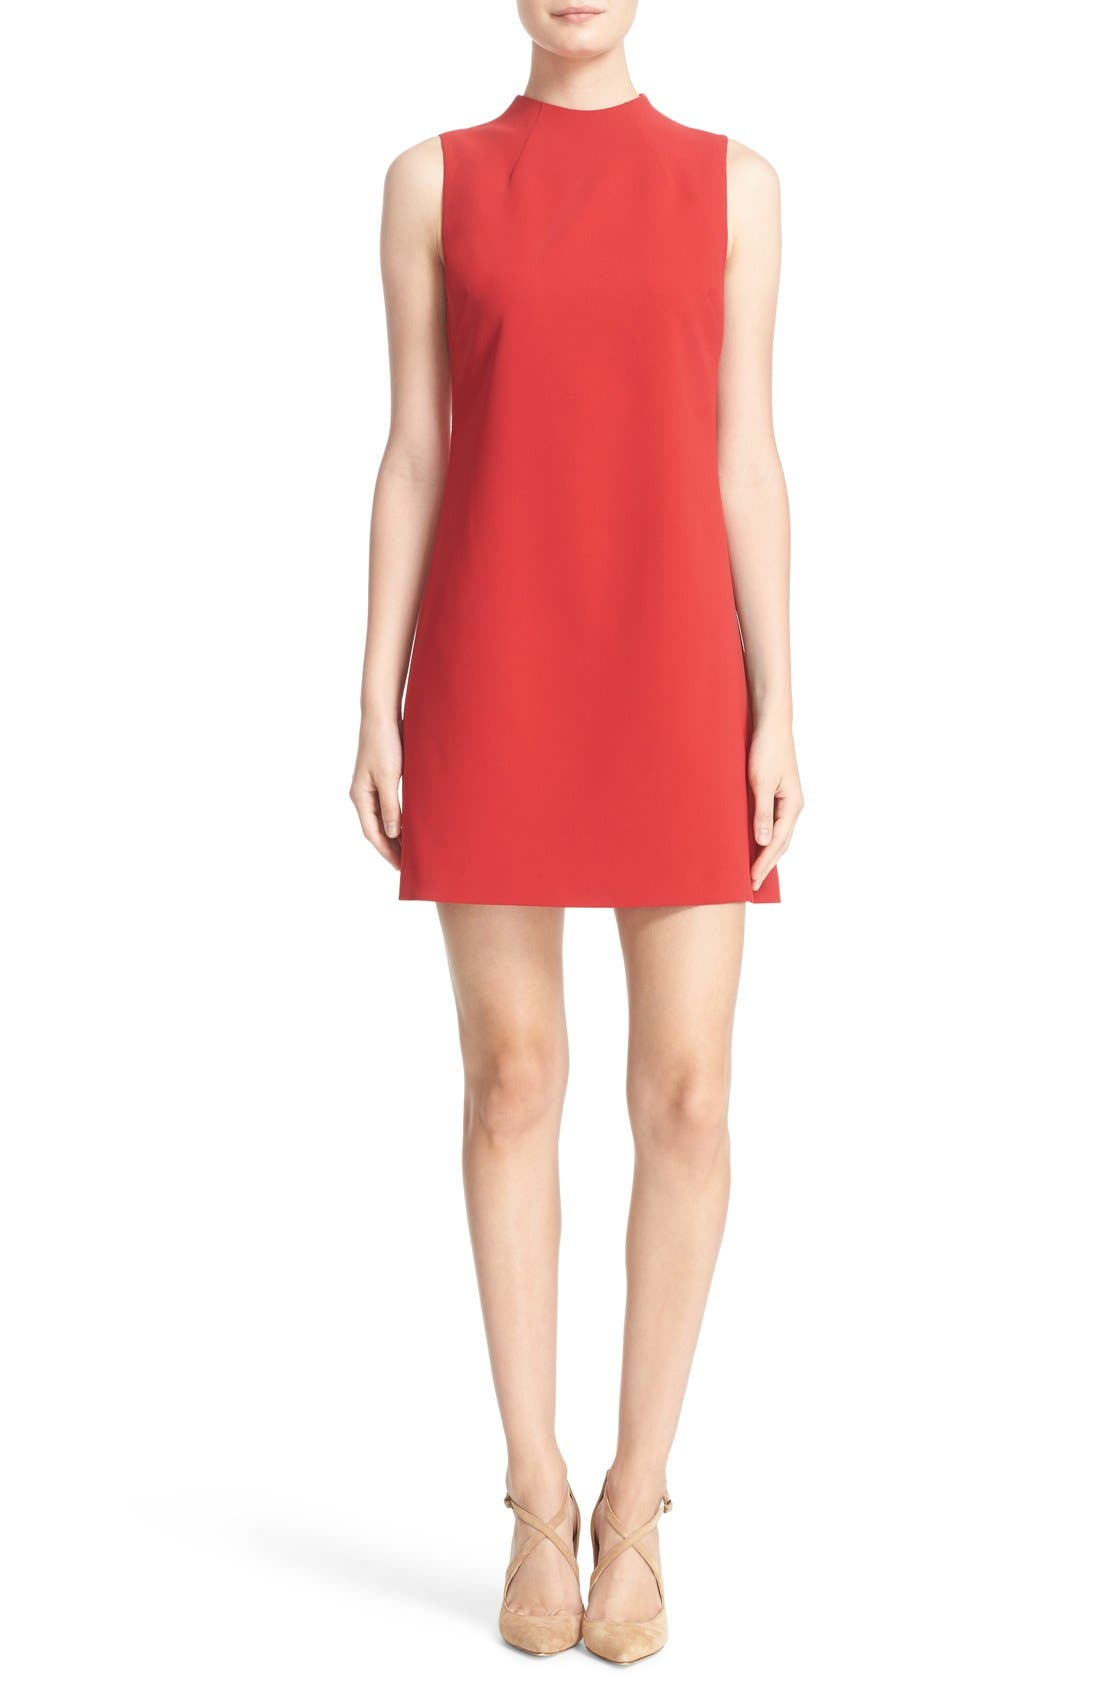 ALICE + OLIVIA,                             'Coley' Mock Neck A-Line Dress,                             Main thumbnail 1, color,                             623